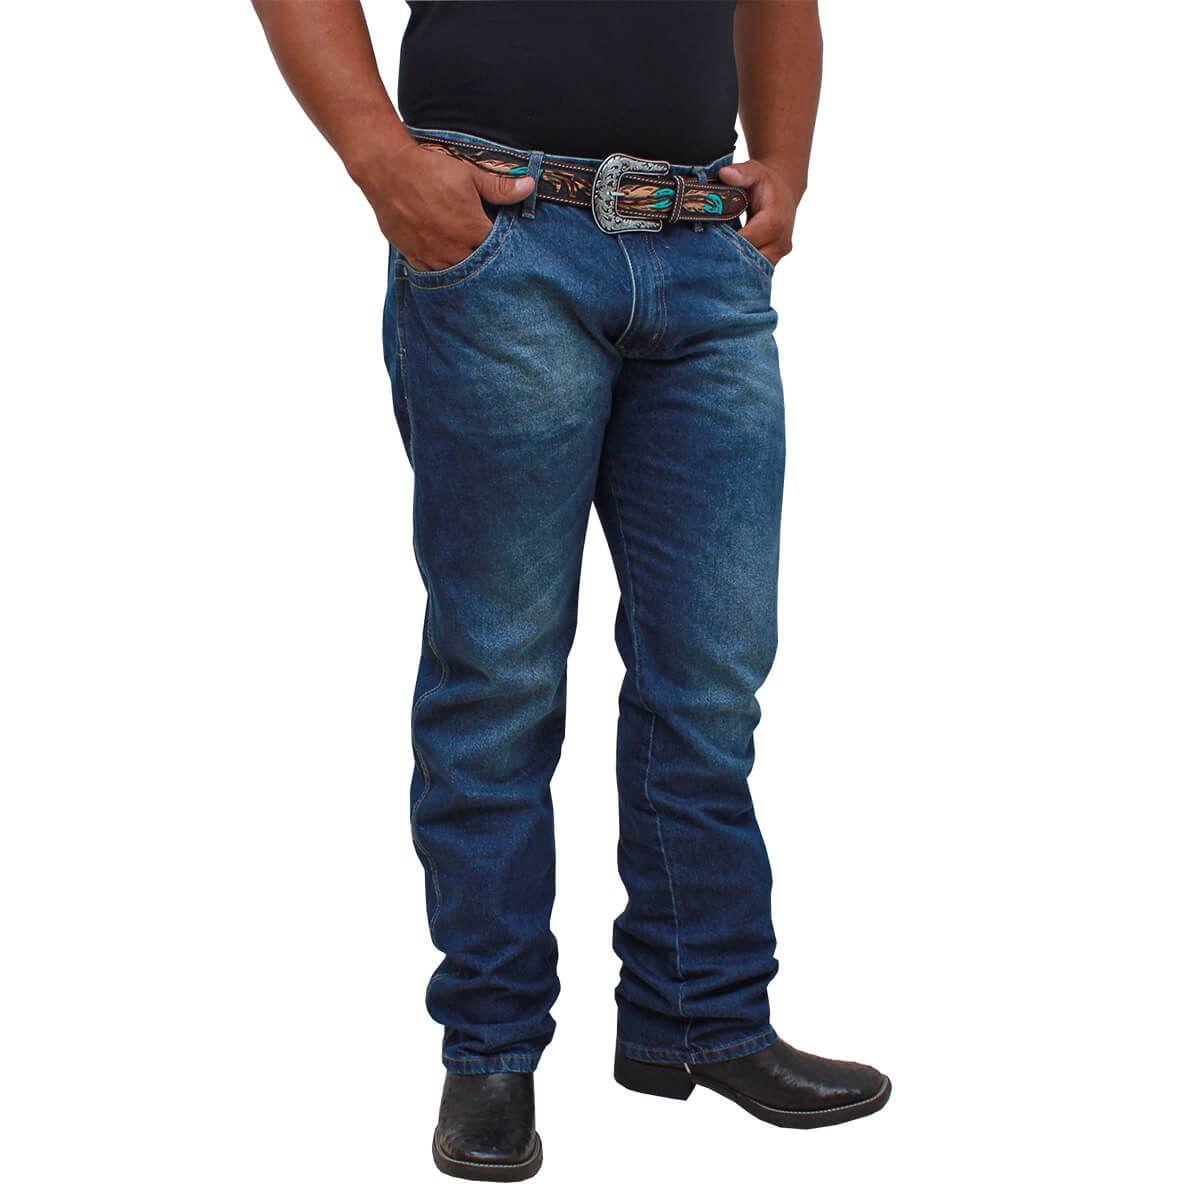 Calça Wrangler Nacional 20X Stone Elaxed Fashion